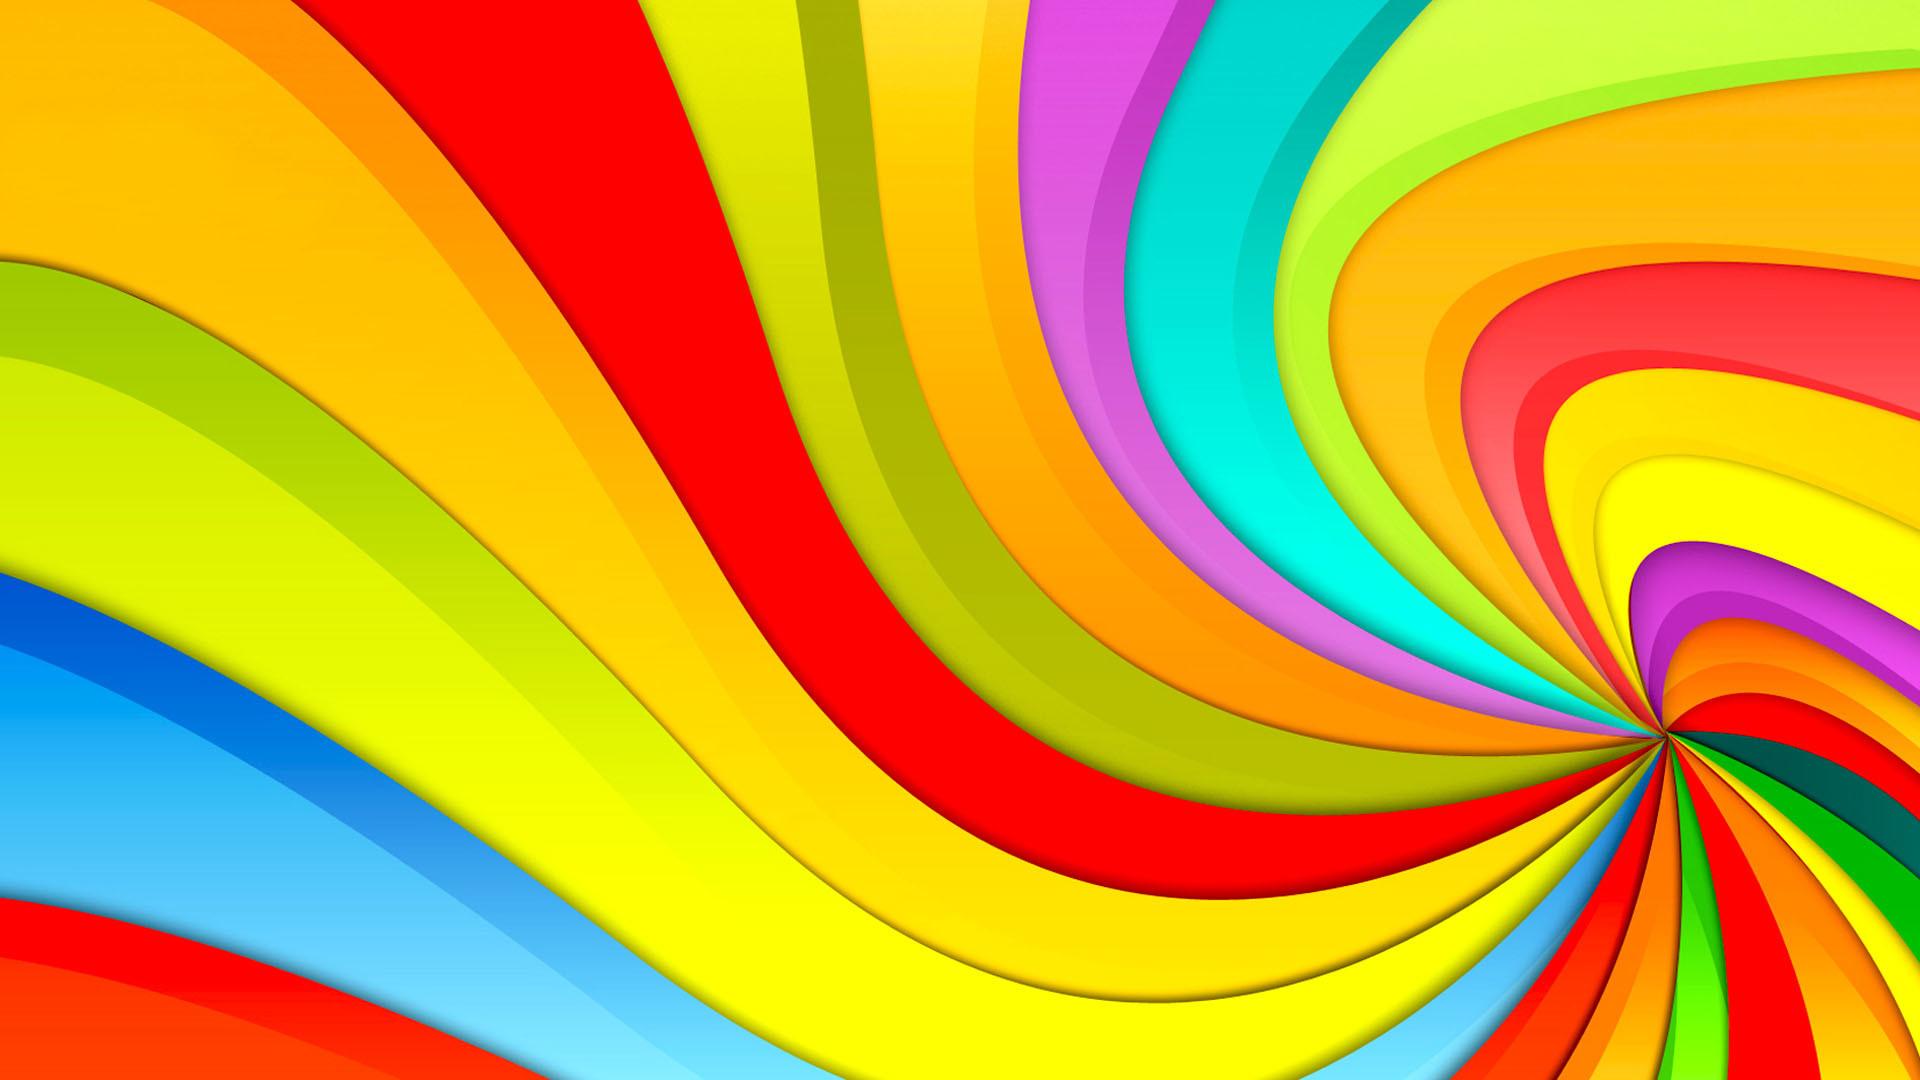 1920x1080 Colorful Desktop Backgrounds